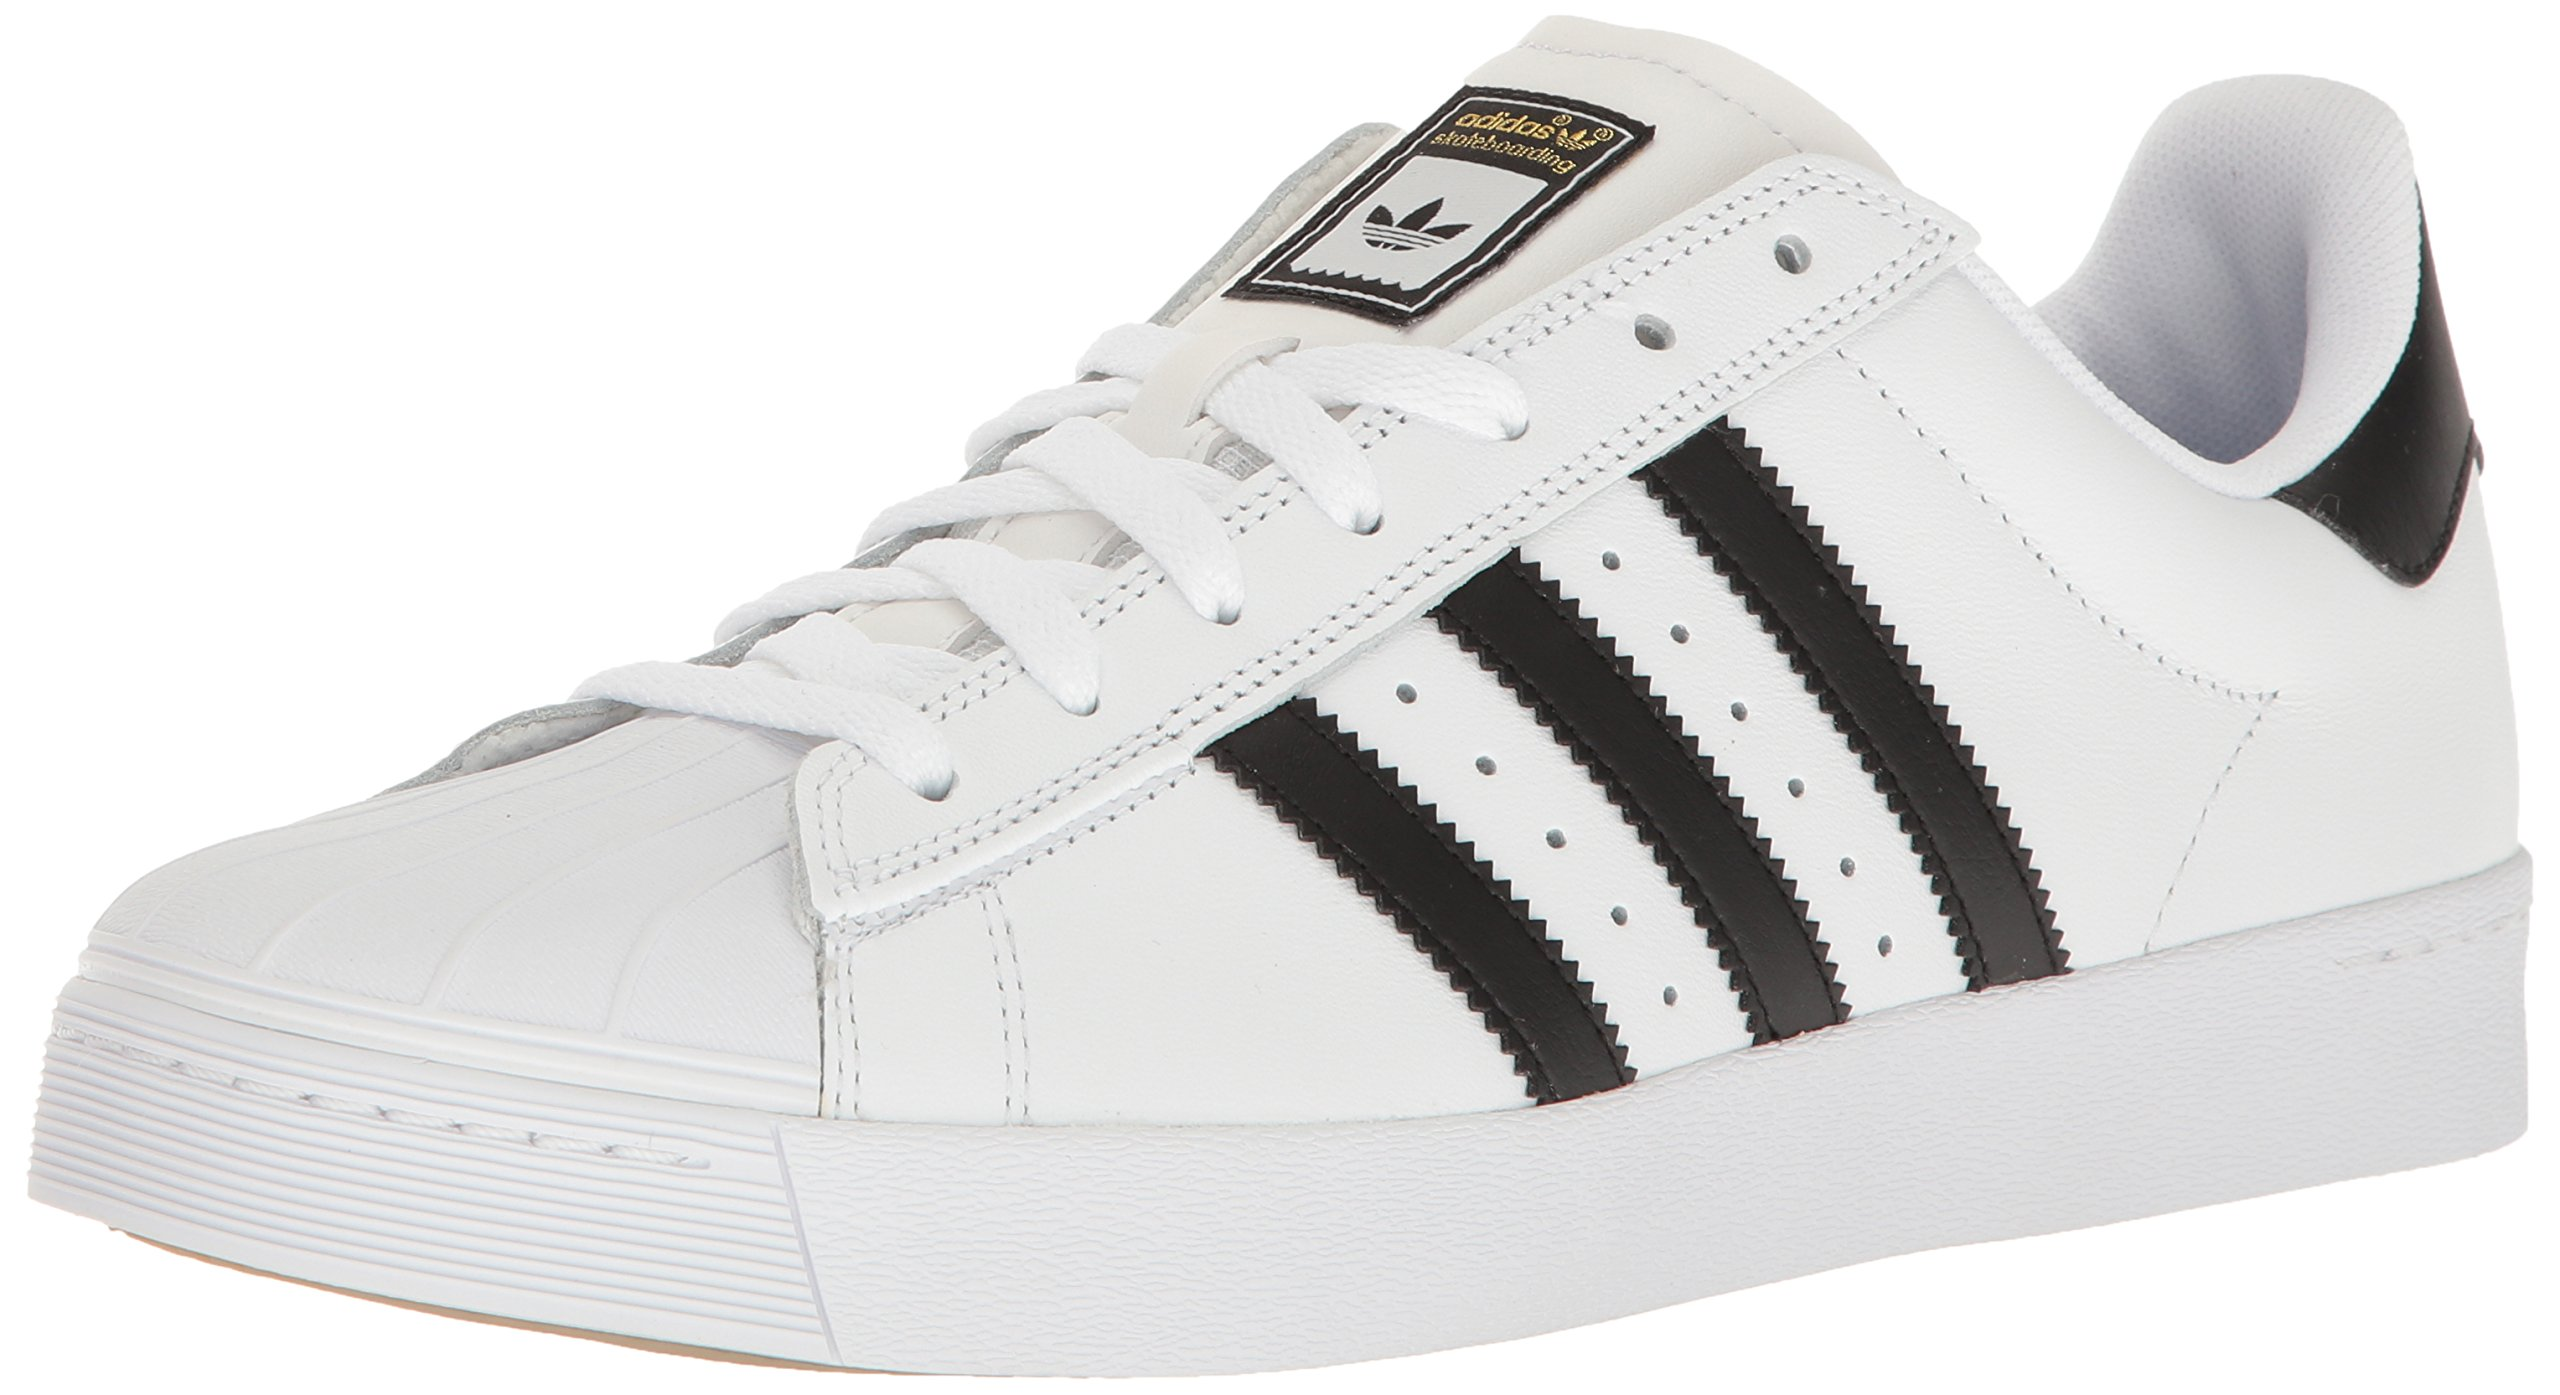 adidas Originals Men's Shoes | Superstar Vulc Adv, White/Core Black/White, (9 M US)